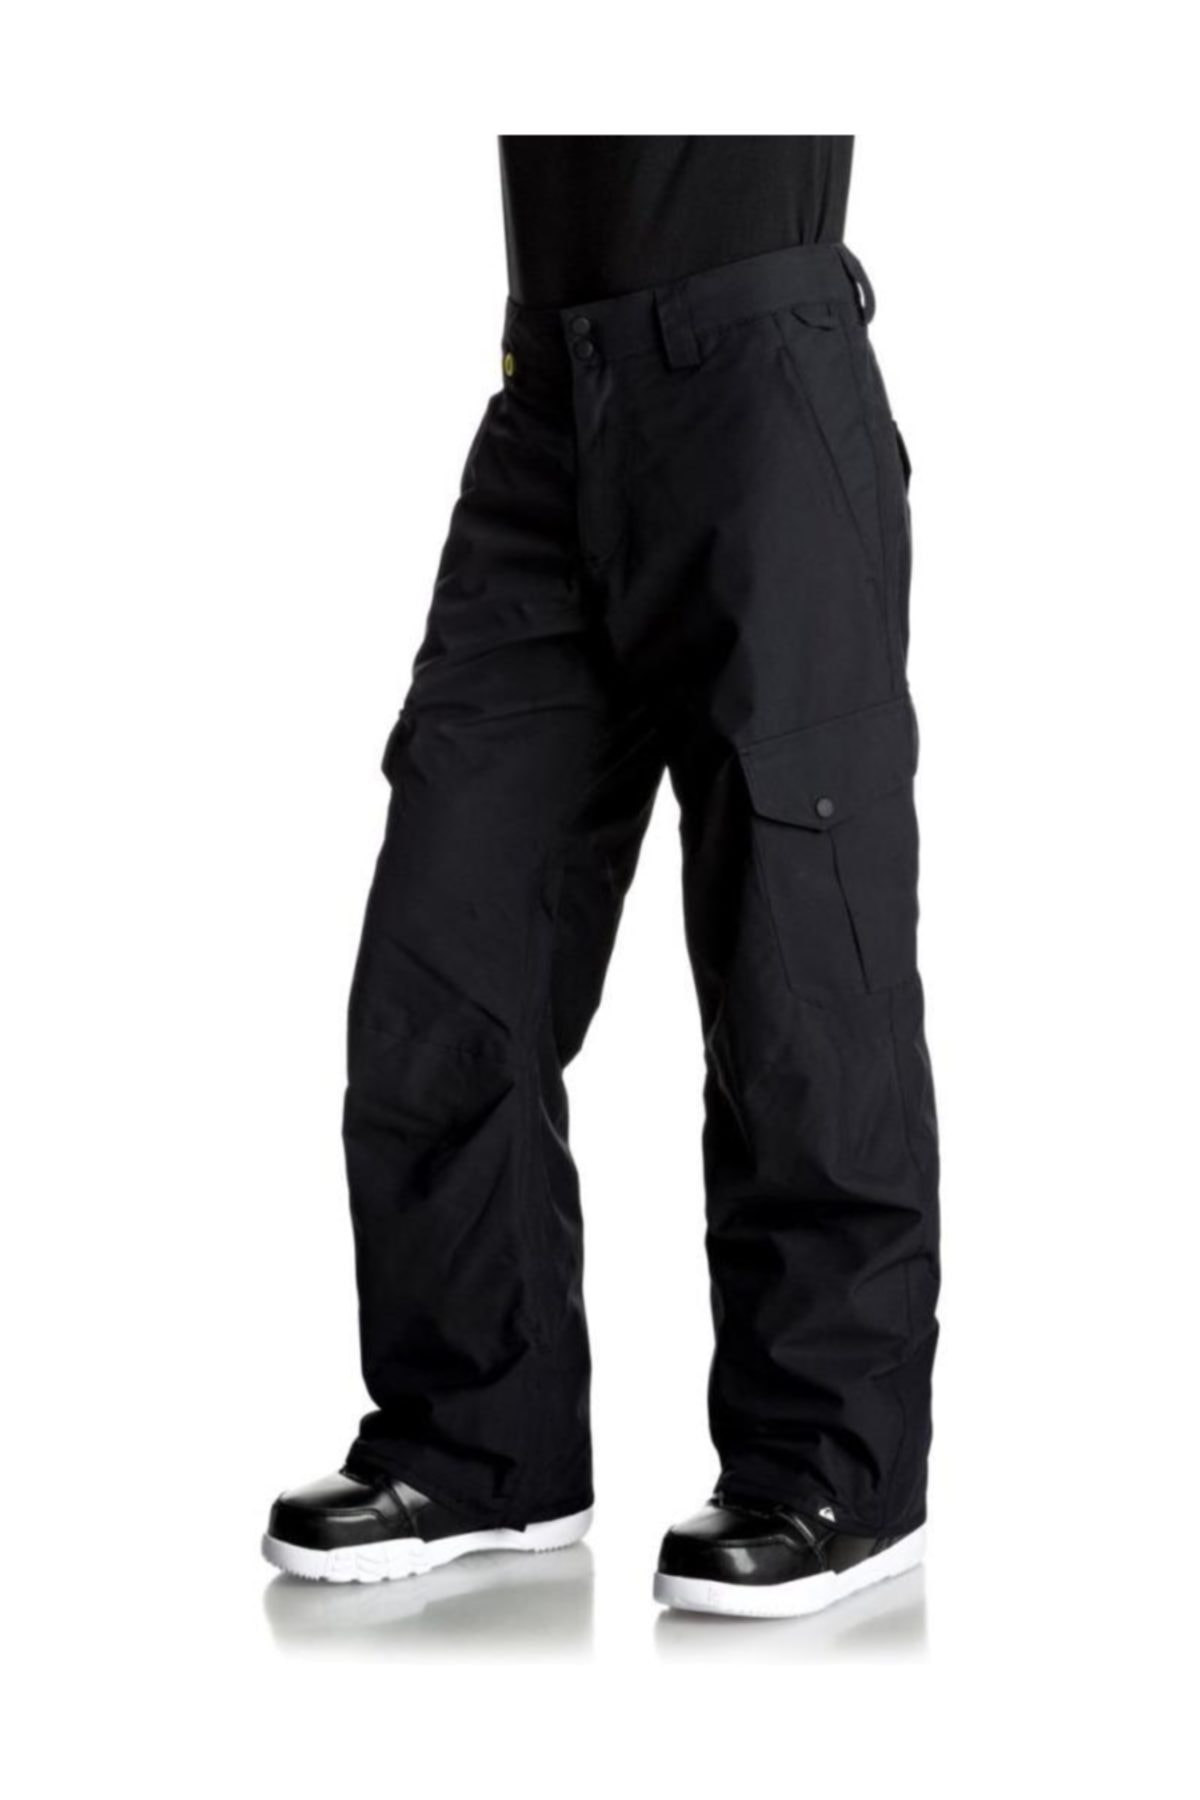 Quiksilver Porter Erkek Kayak ve Snowboard Pantolonu Siyah 2